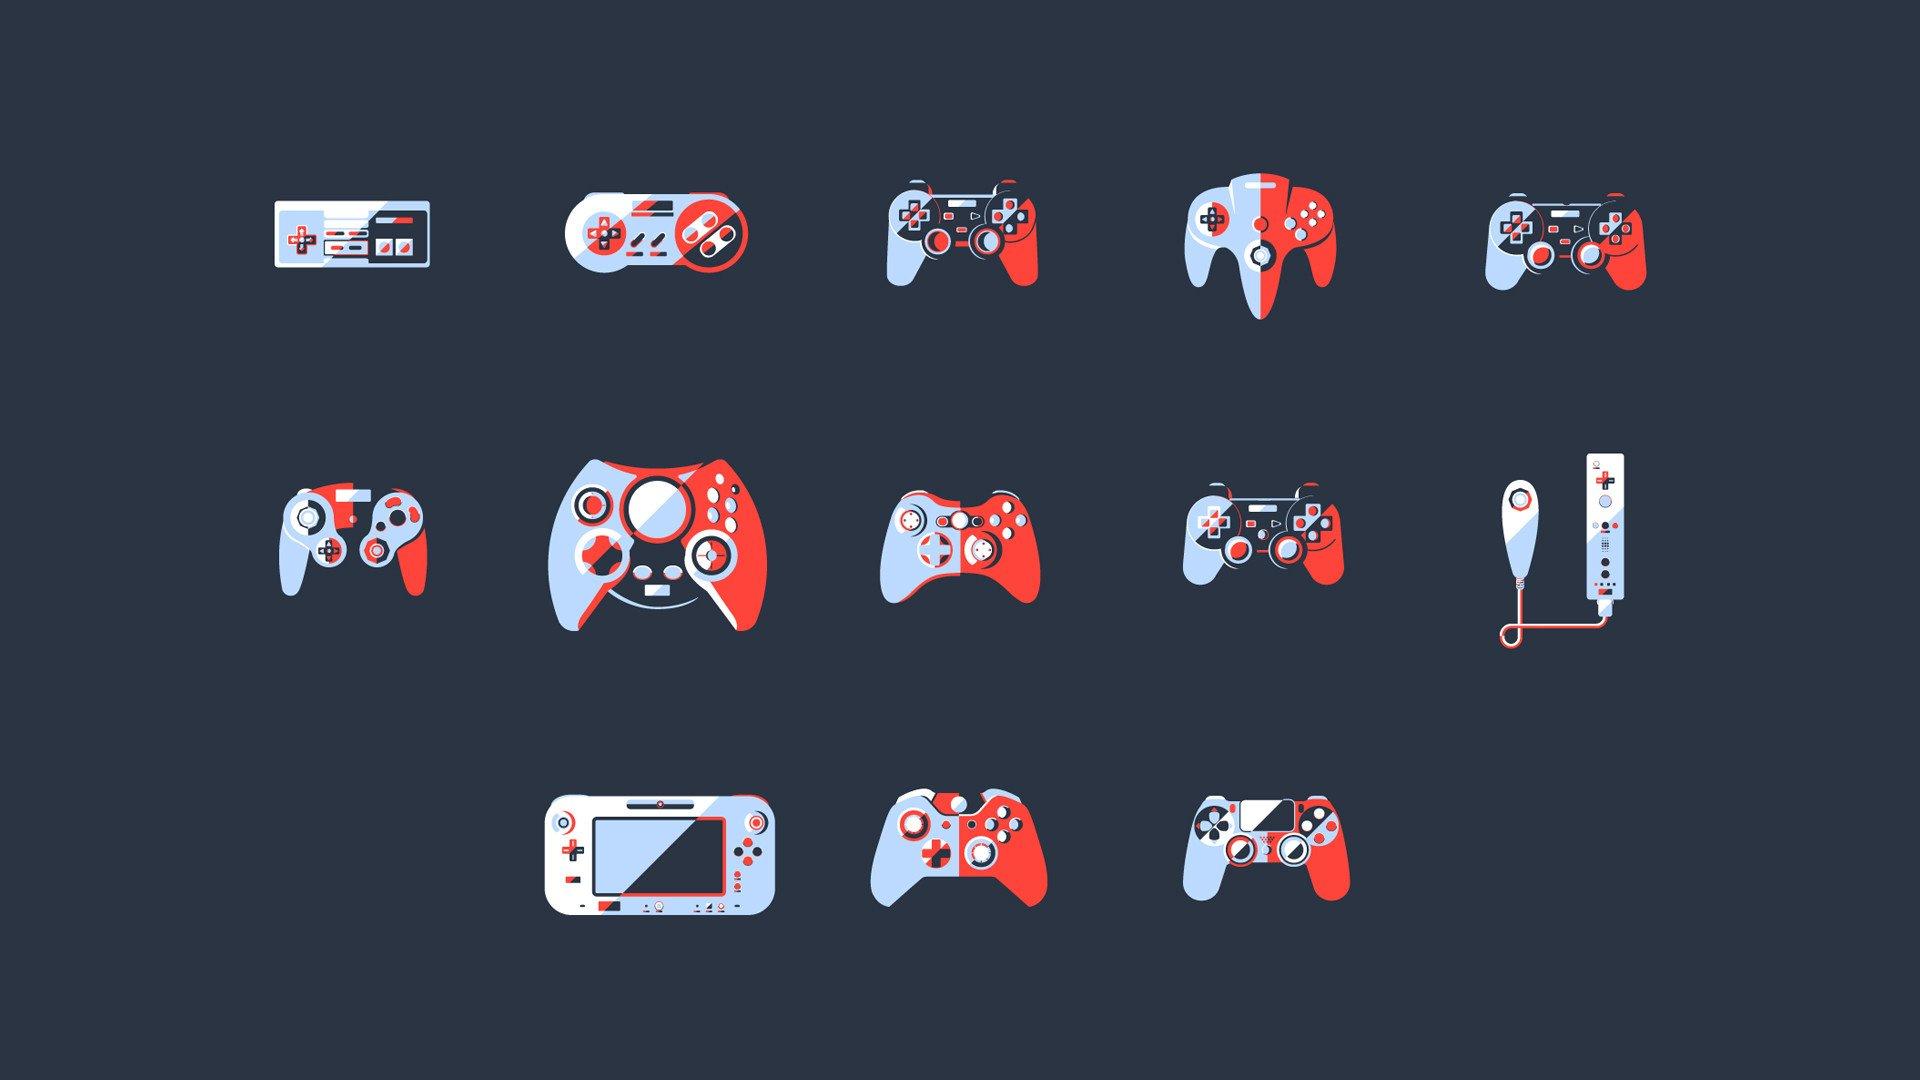 Retro Gaming wallpaper image hd